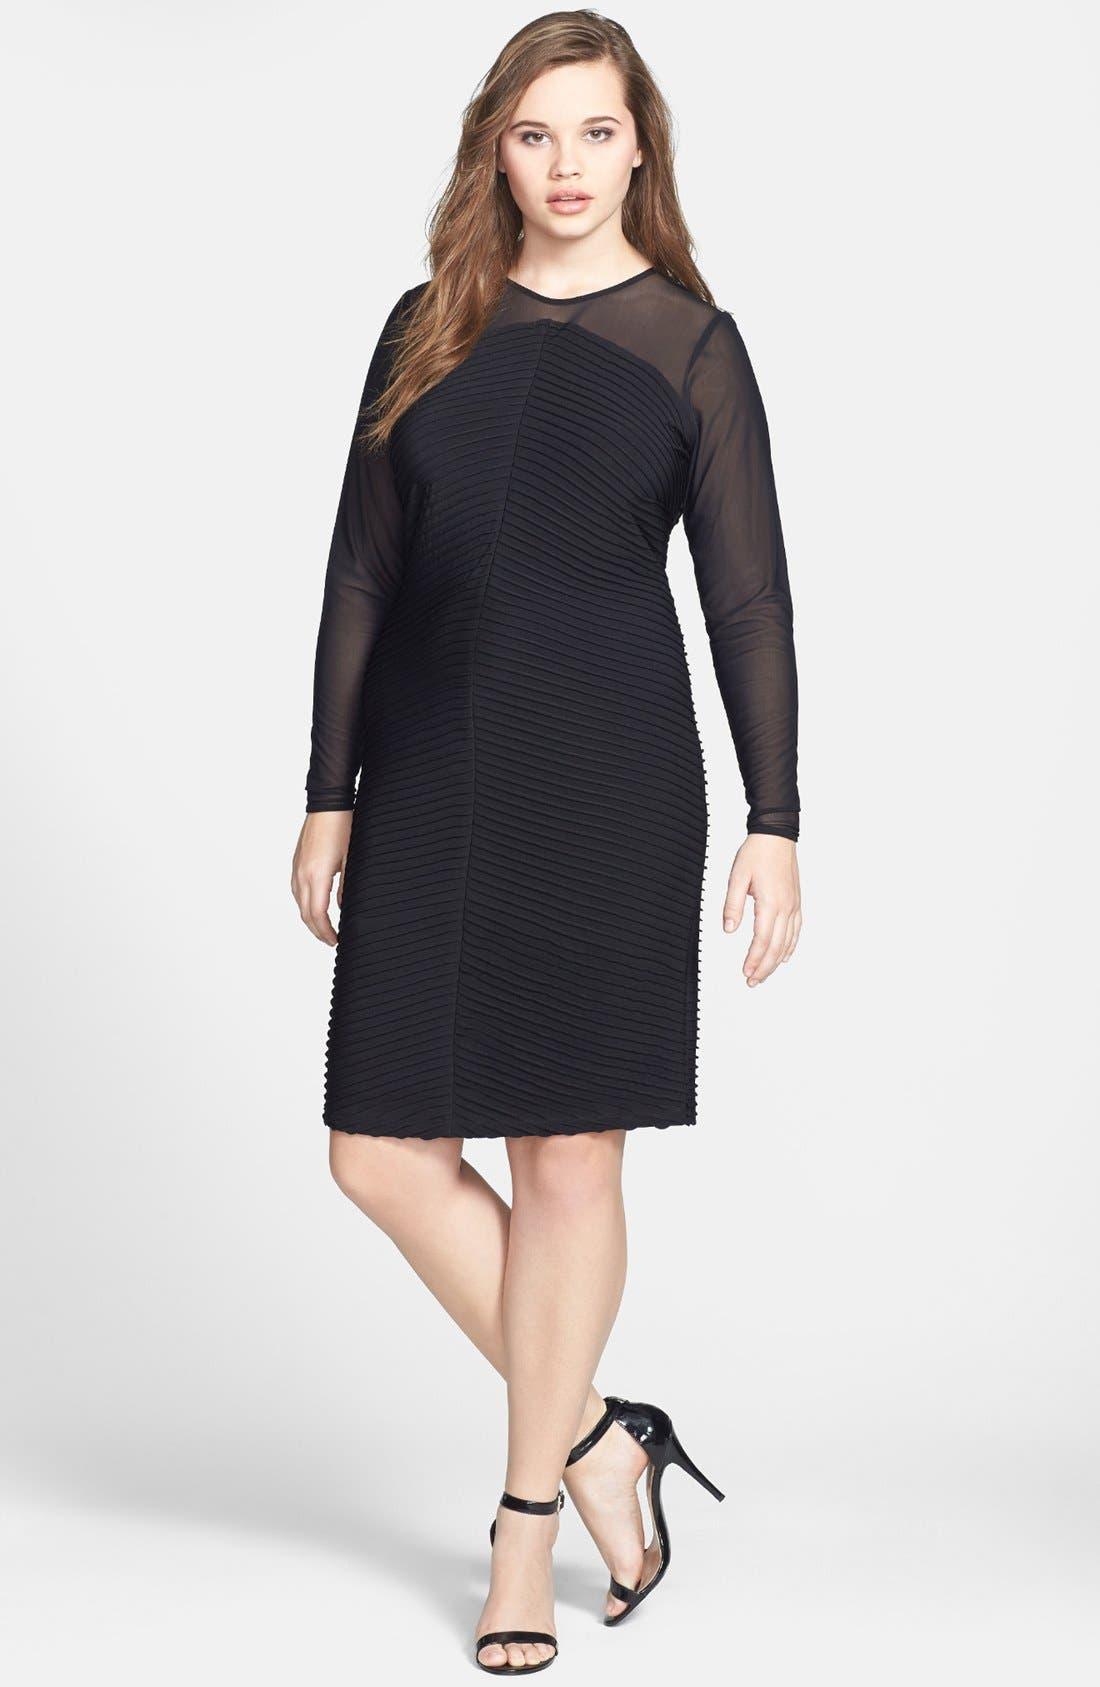 Alternate Image 1 Selected - Calvin Klein Illusion Yoke & Sleeve Matte Jersey Sheath Dress (Plus Size)